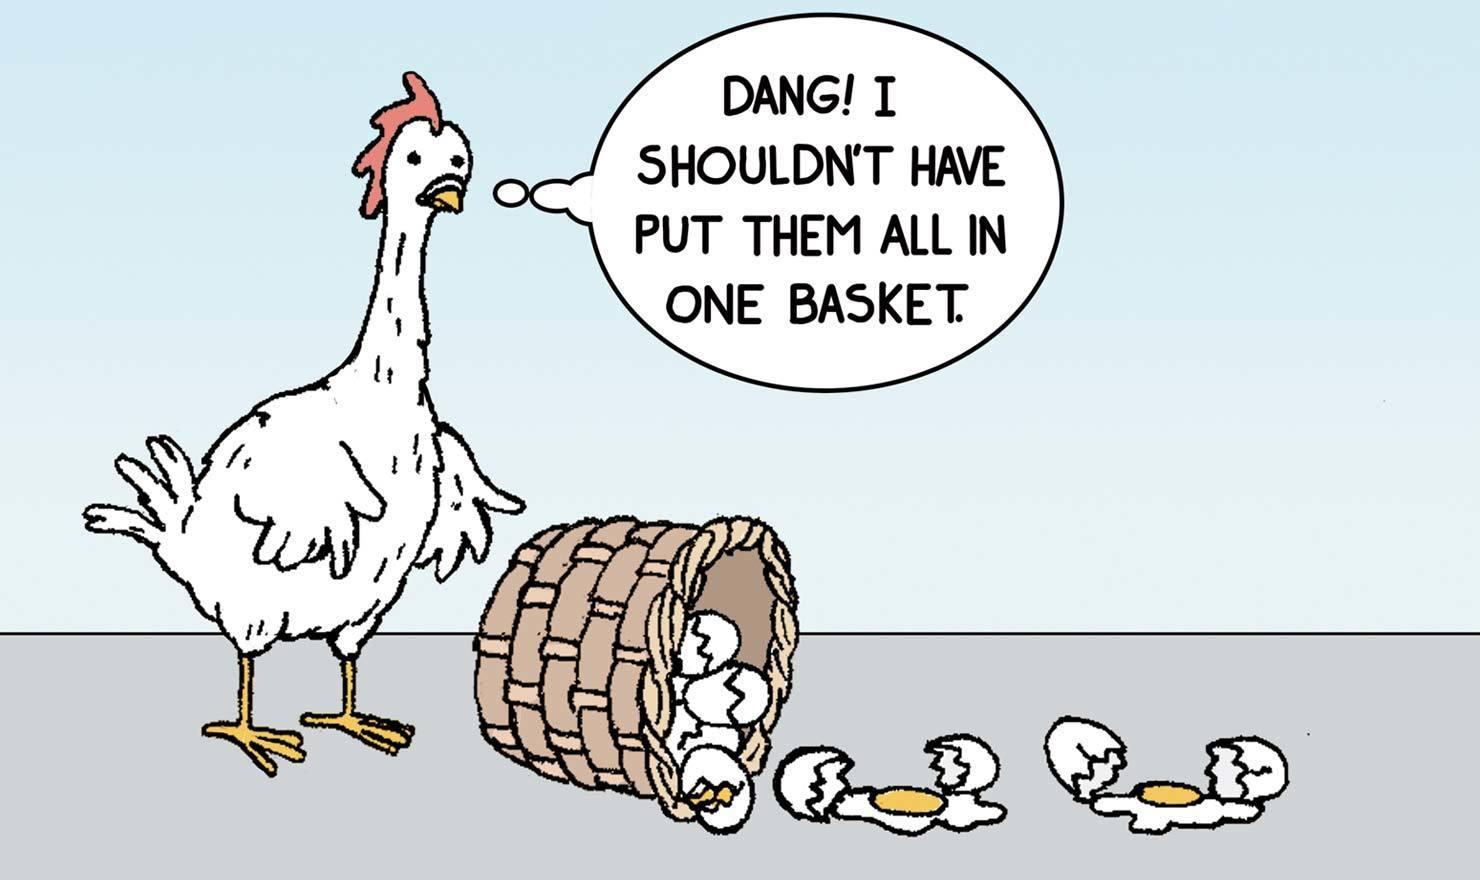 A Dozen Egg Day Comics That'll Crack You Up -- No Yolk!